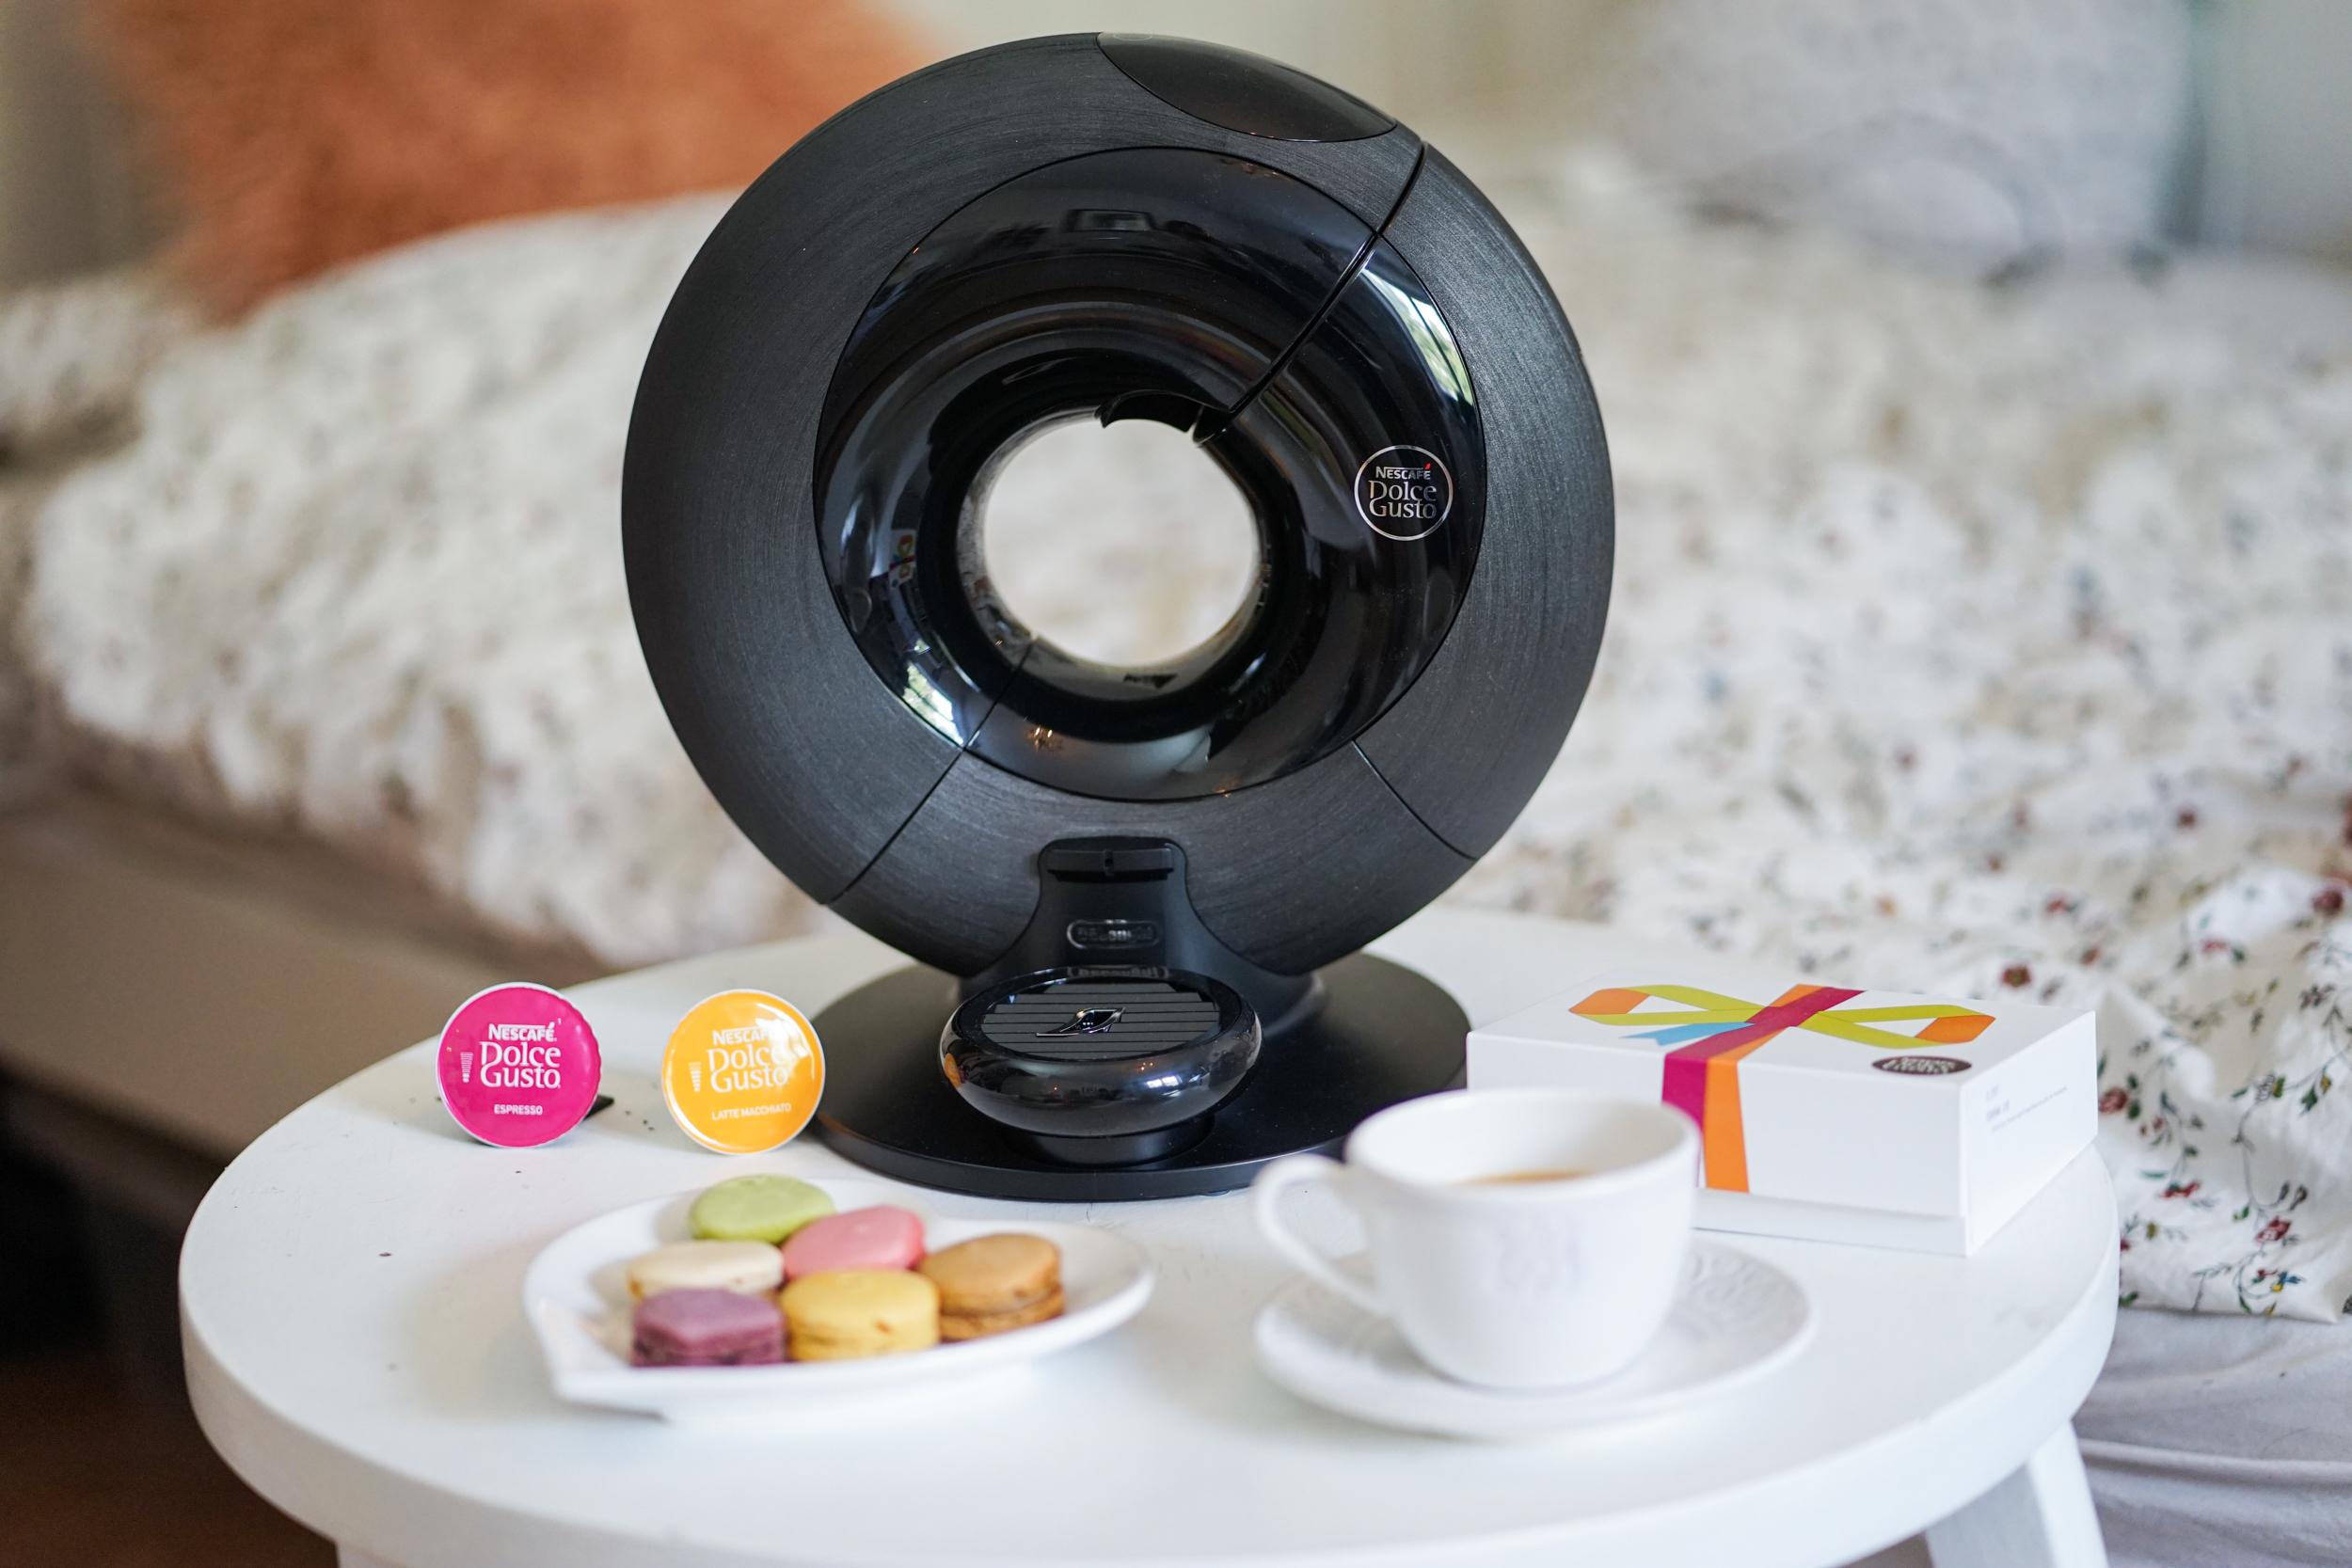 franziska elea fashionblog aus m nchen dolce gusto eclipse. Black Bedroom Furniture Sets. Home Design Ideas